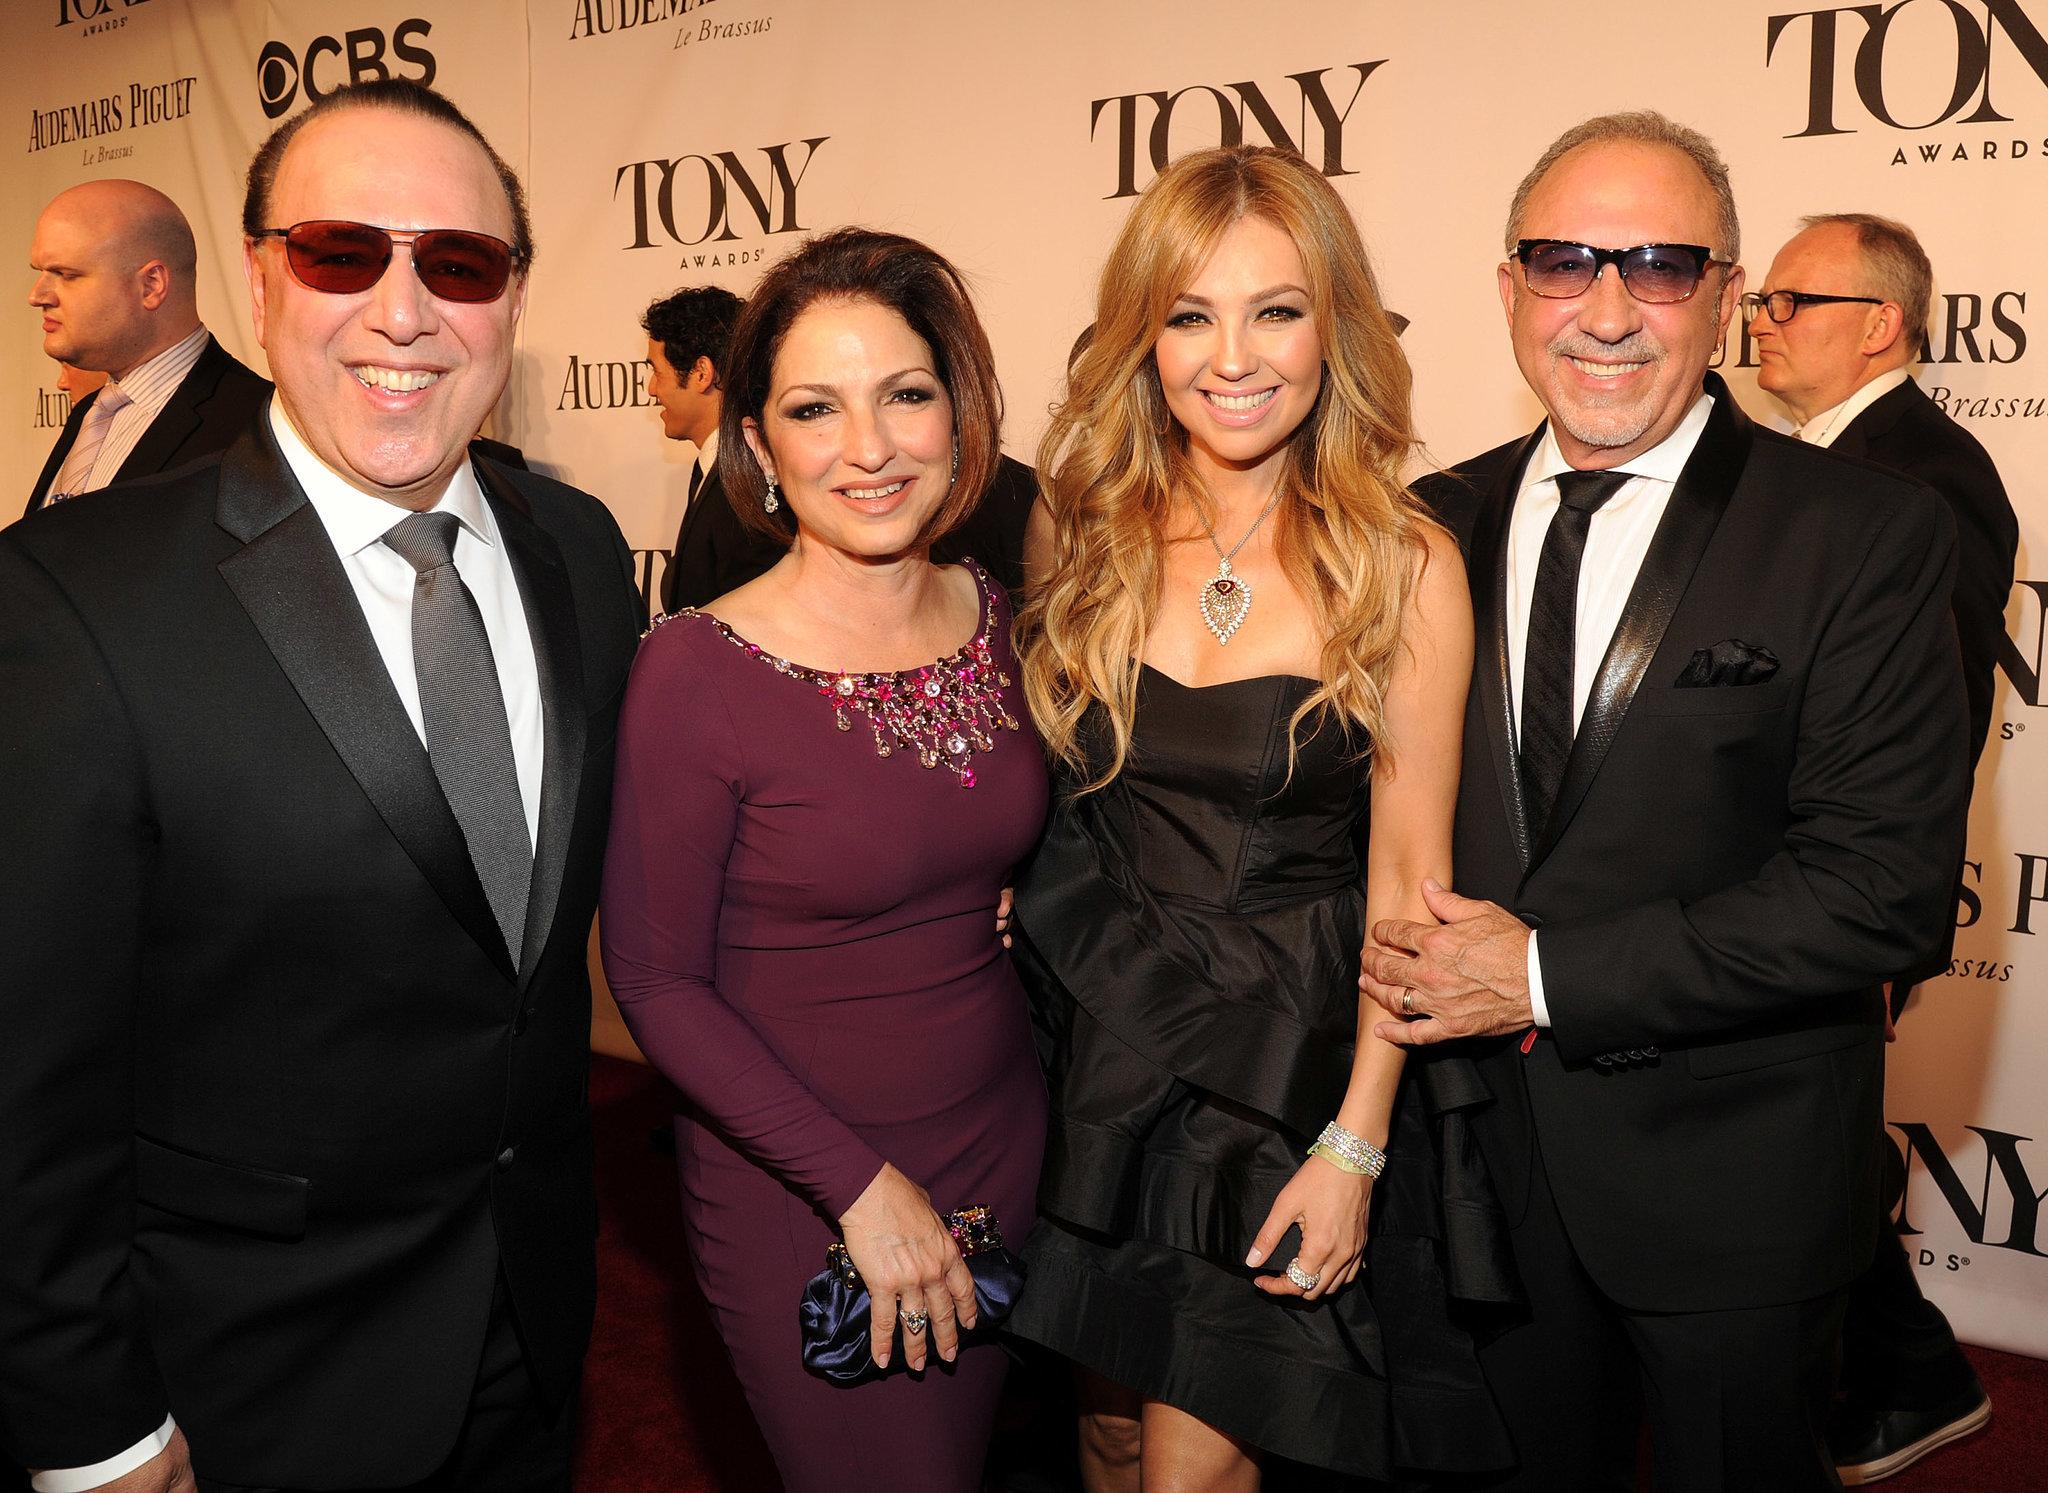 Tommy Mottola, Gloria Estefan, Thalia, and Emilio Estefan mingled on the carpet.